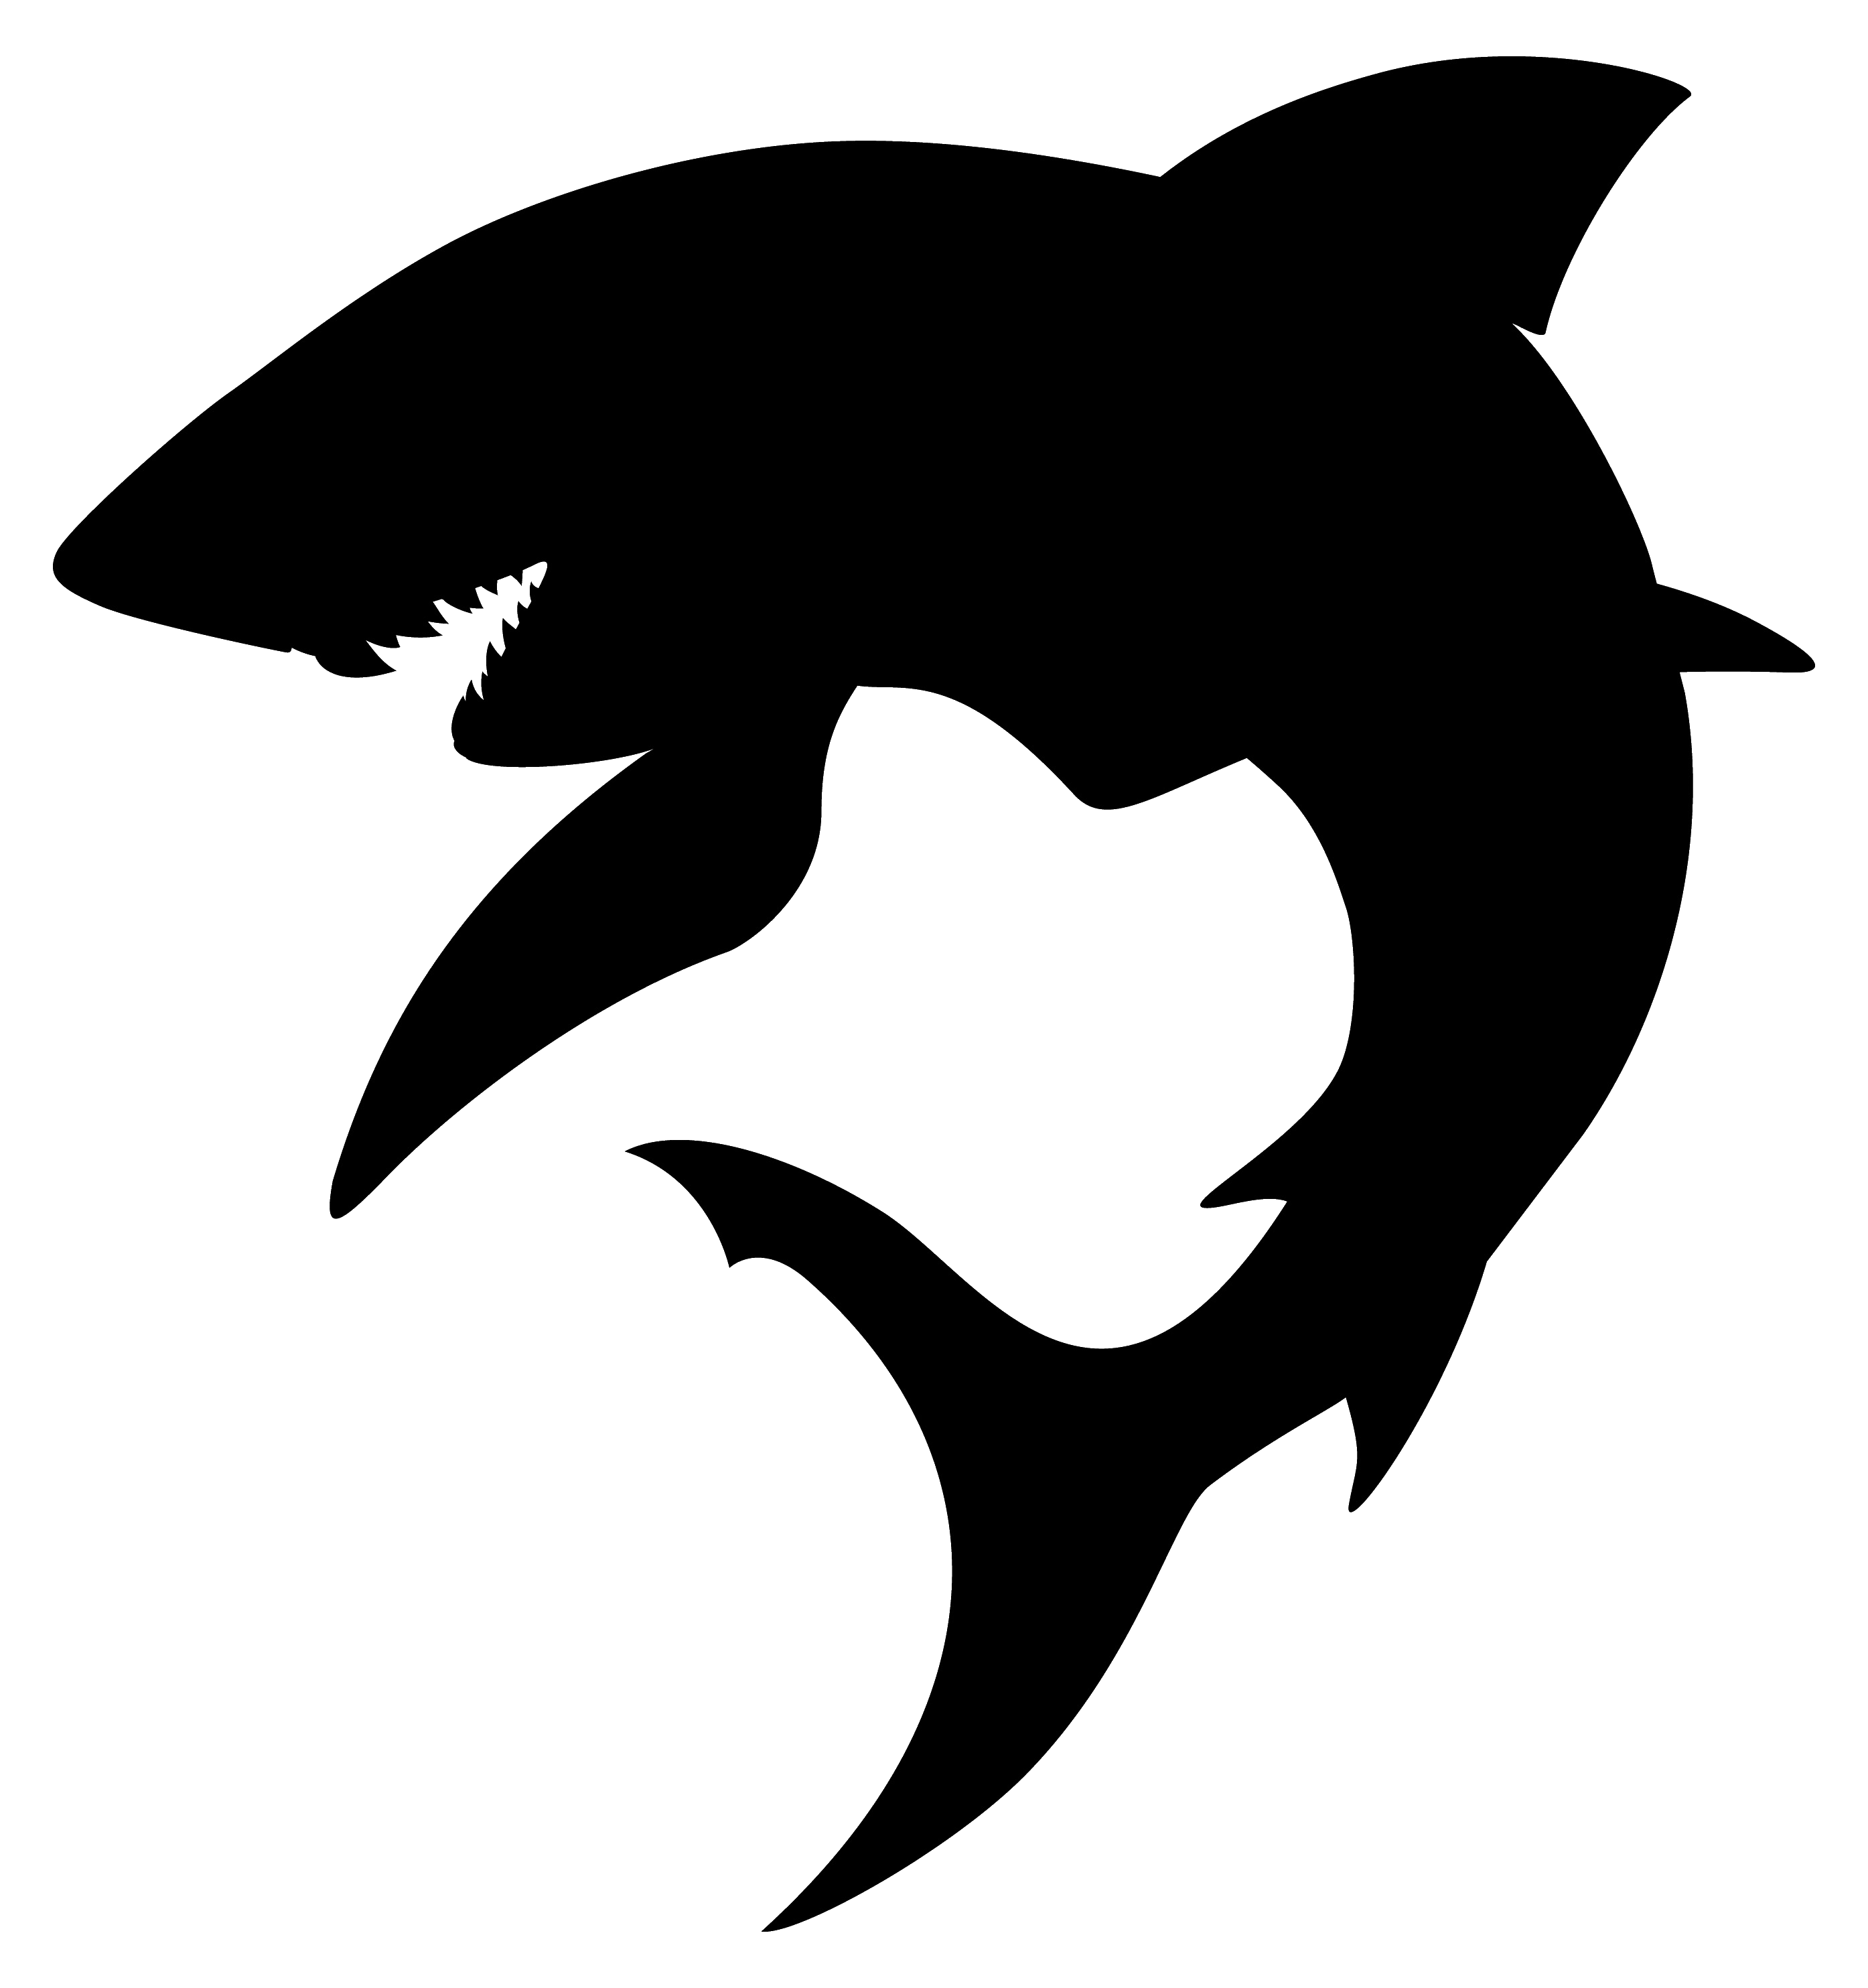 2789x2968 Great White Shark Silhouette Tattoo 8906218